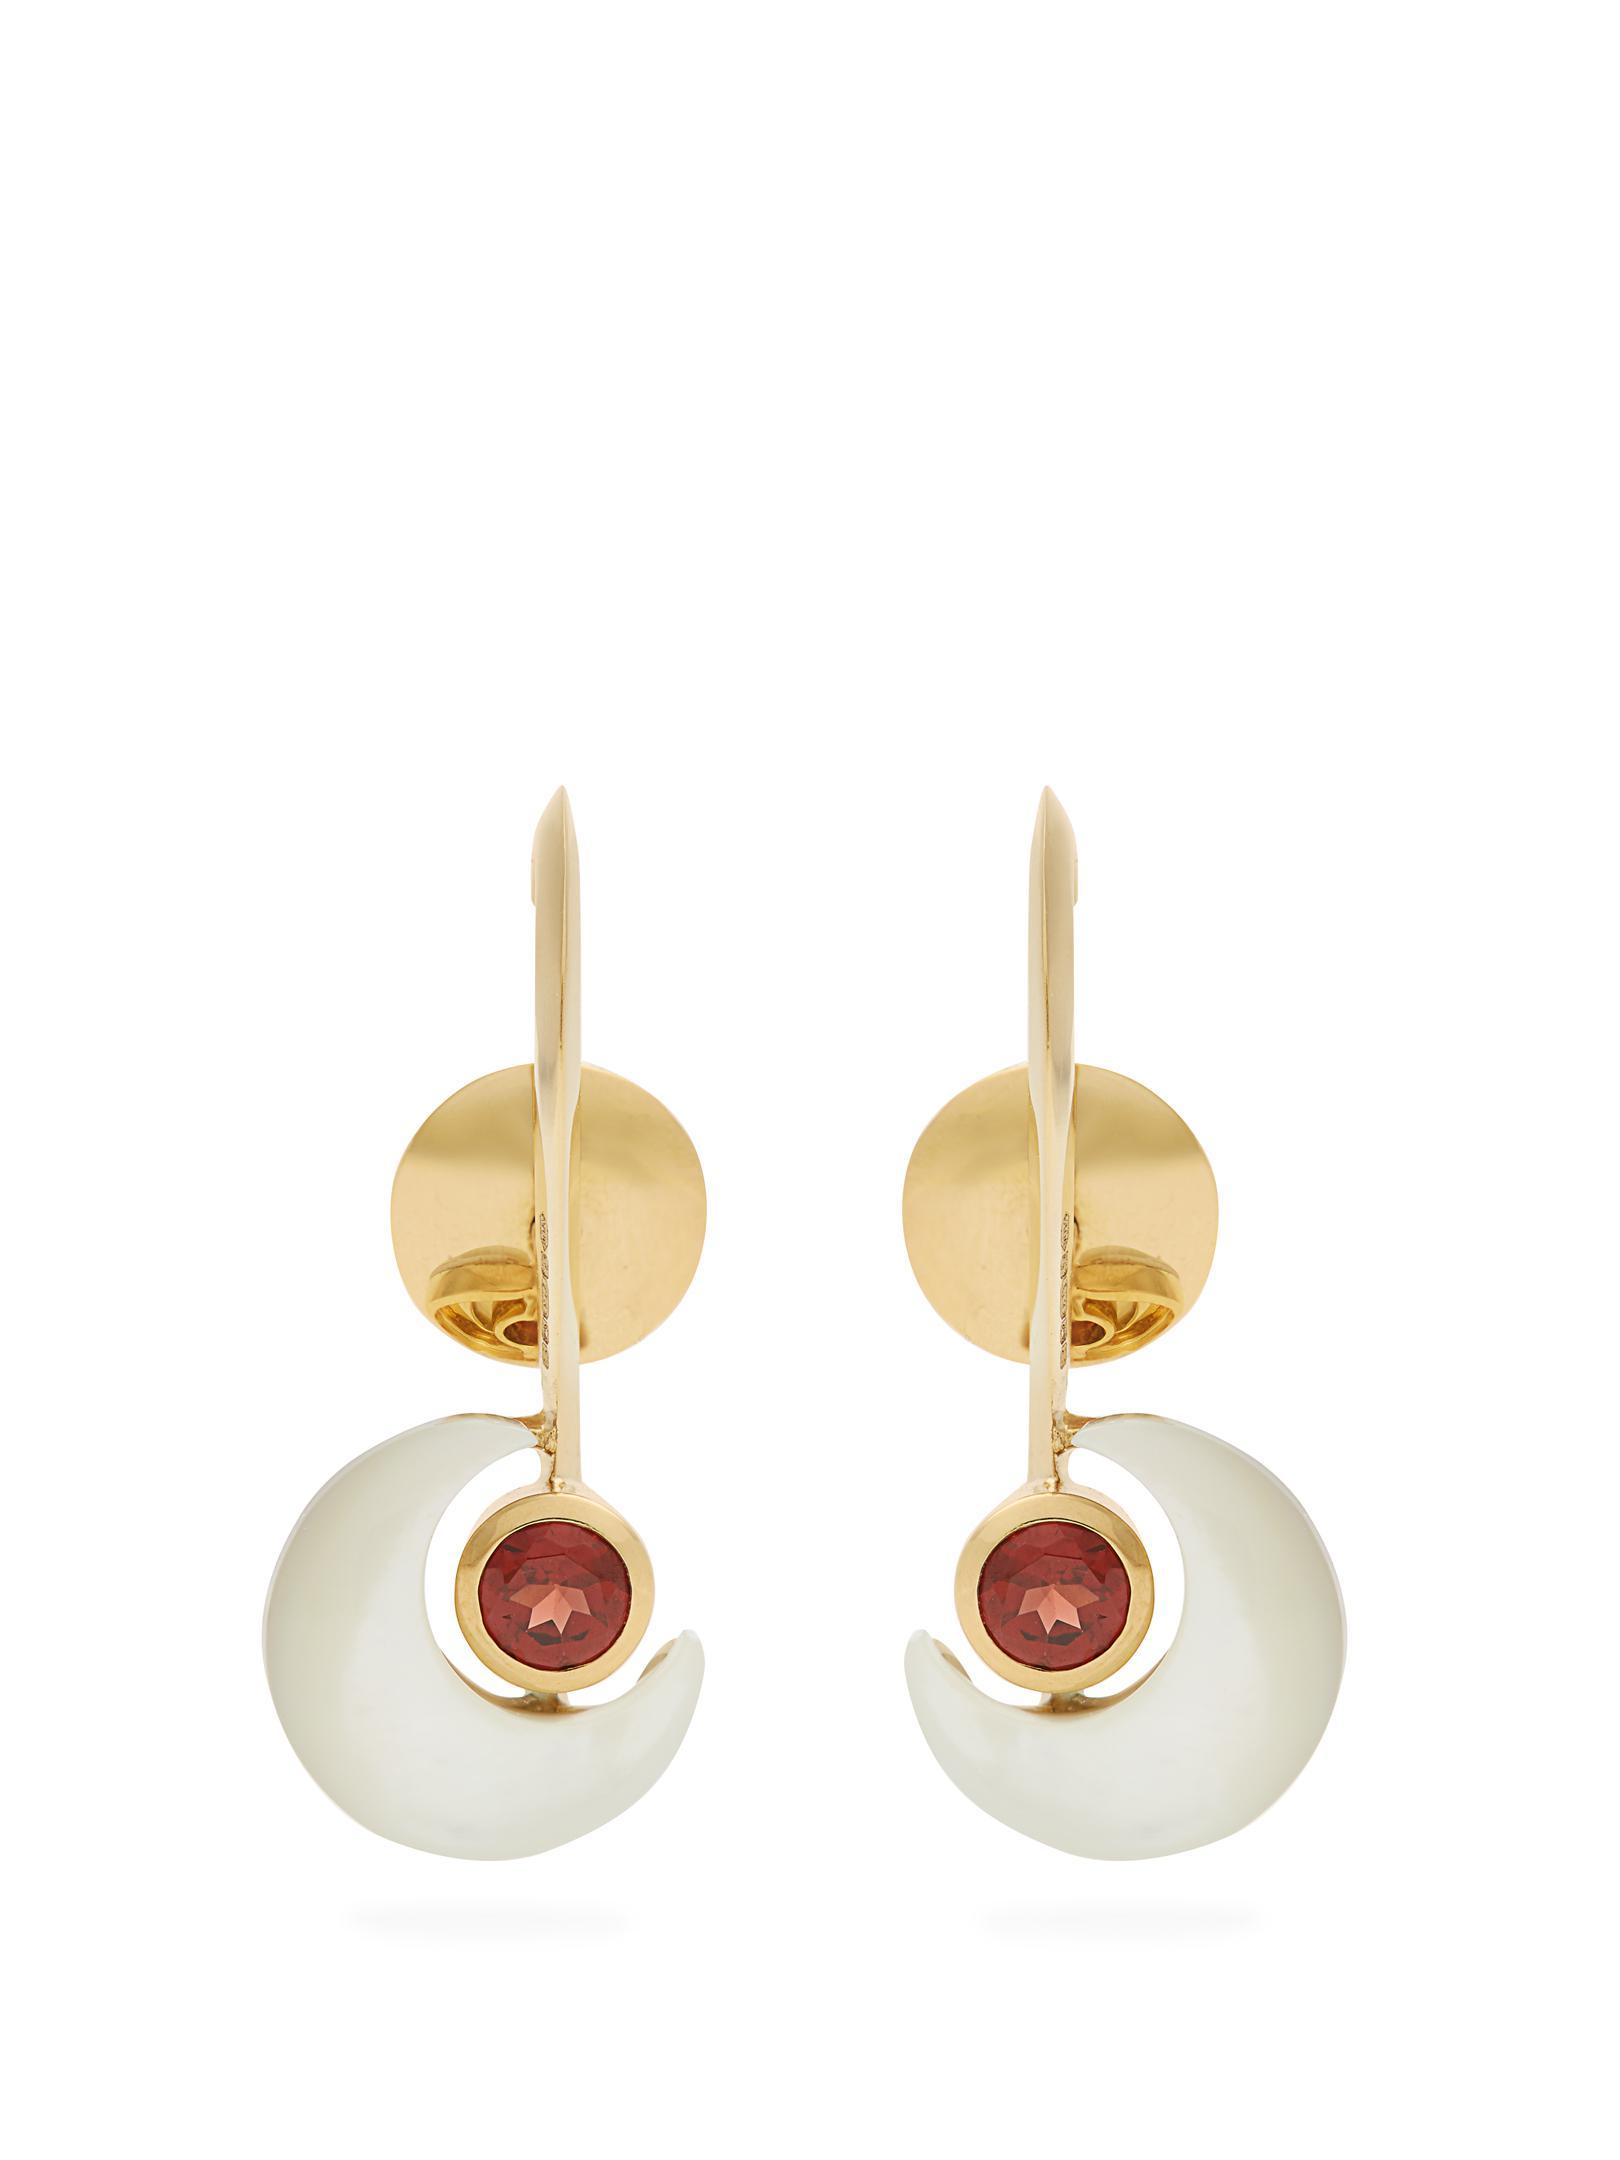 Ara Vartanian X Kate Moss garnet & gold earrings 6p2CECX